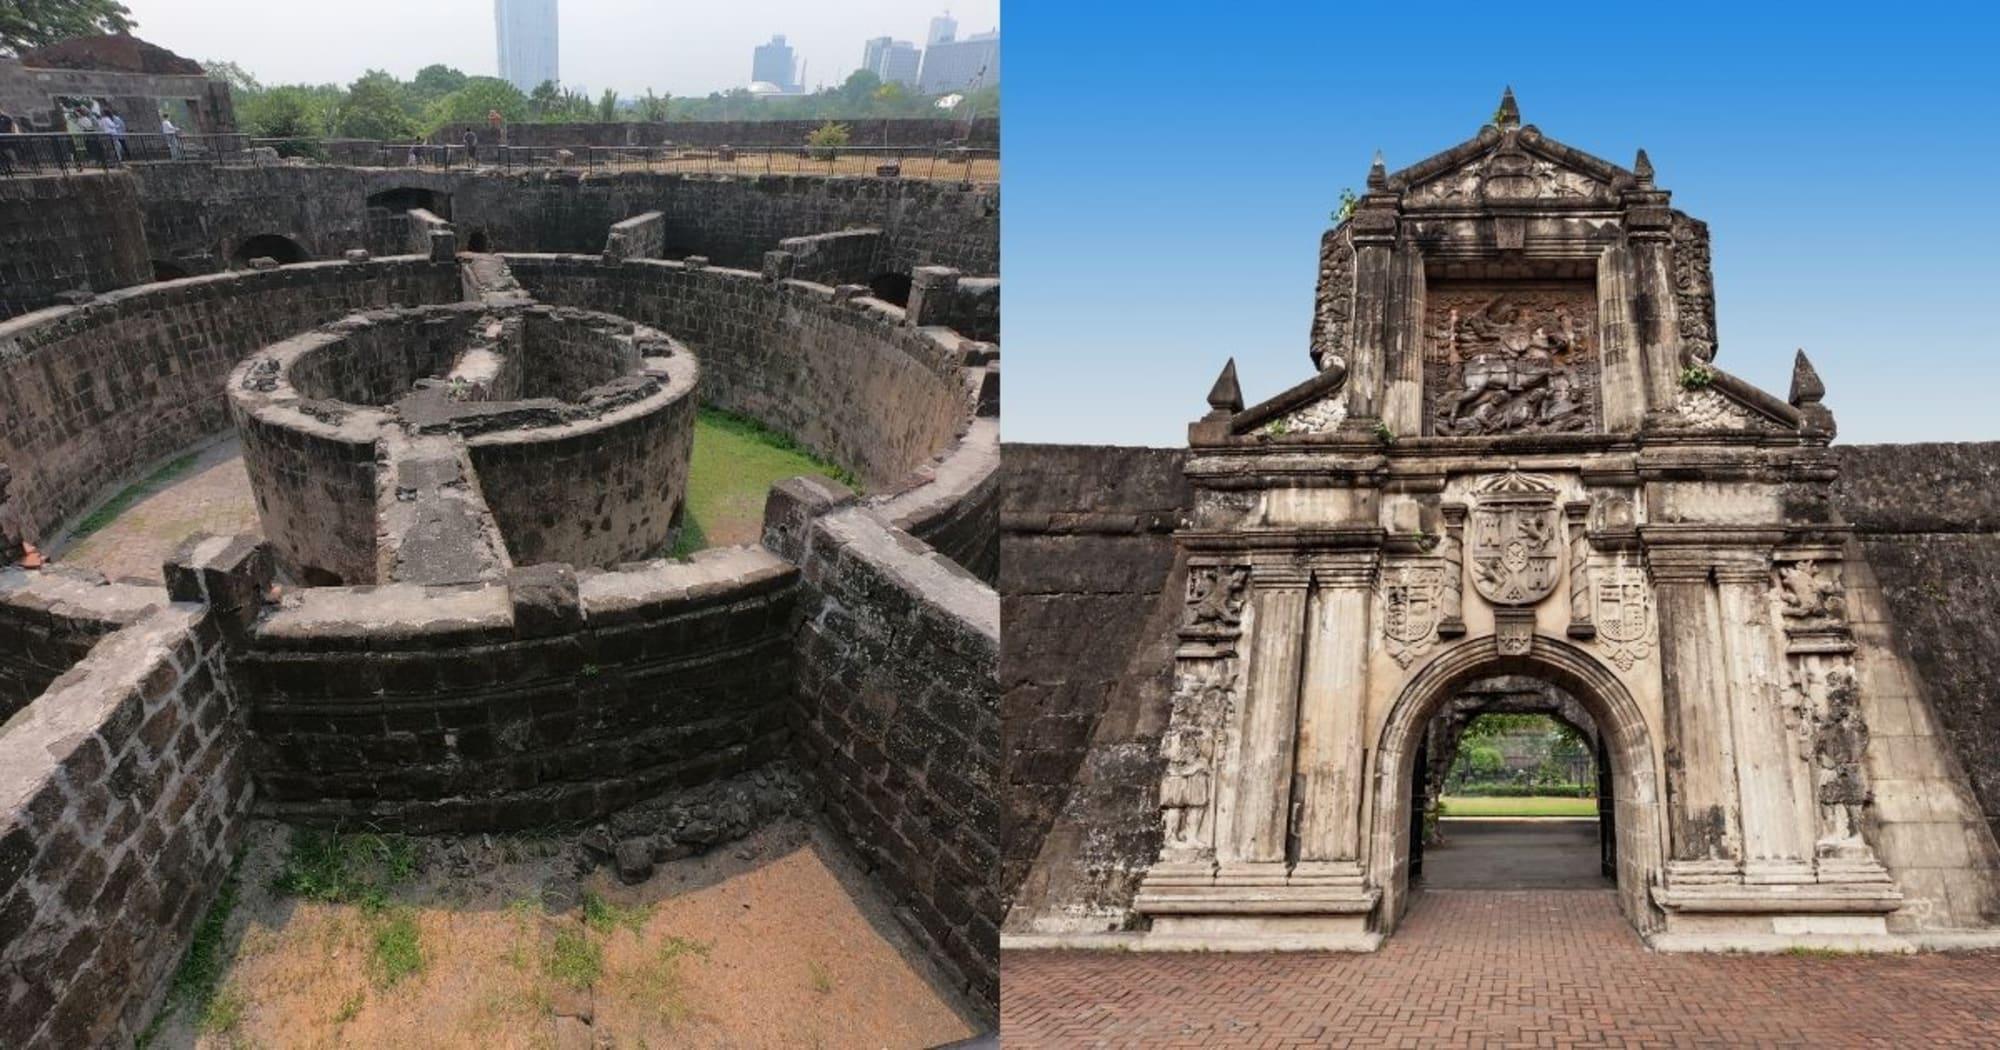 Intramuros to open Fort Santiago, Baluarte de San Diego to visitors today May 17 -DOT